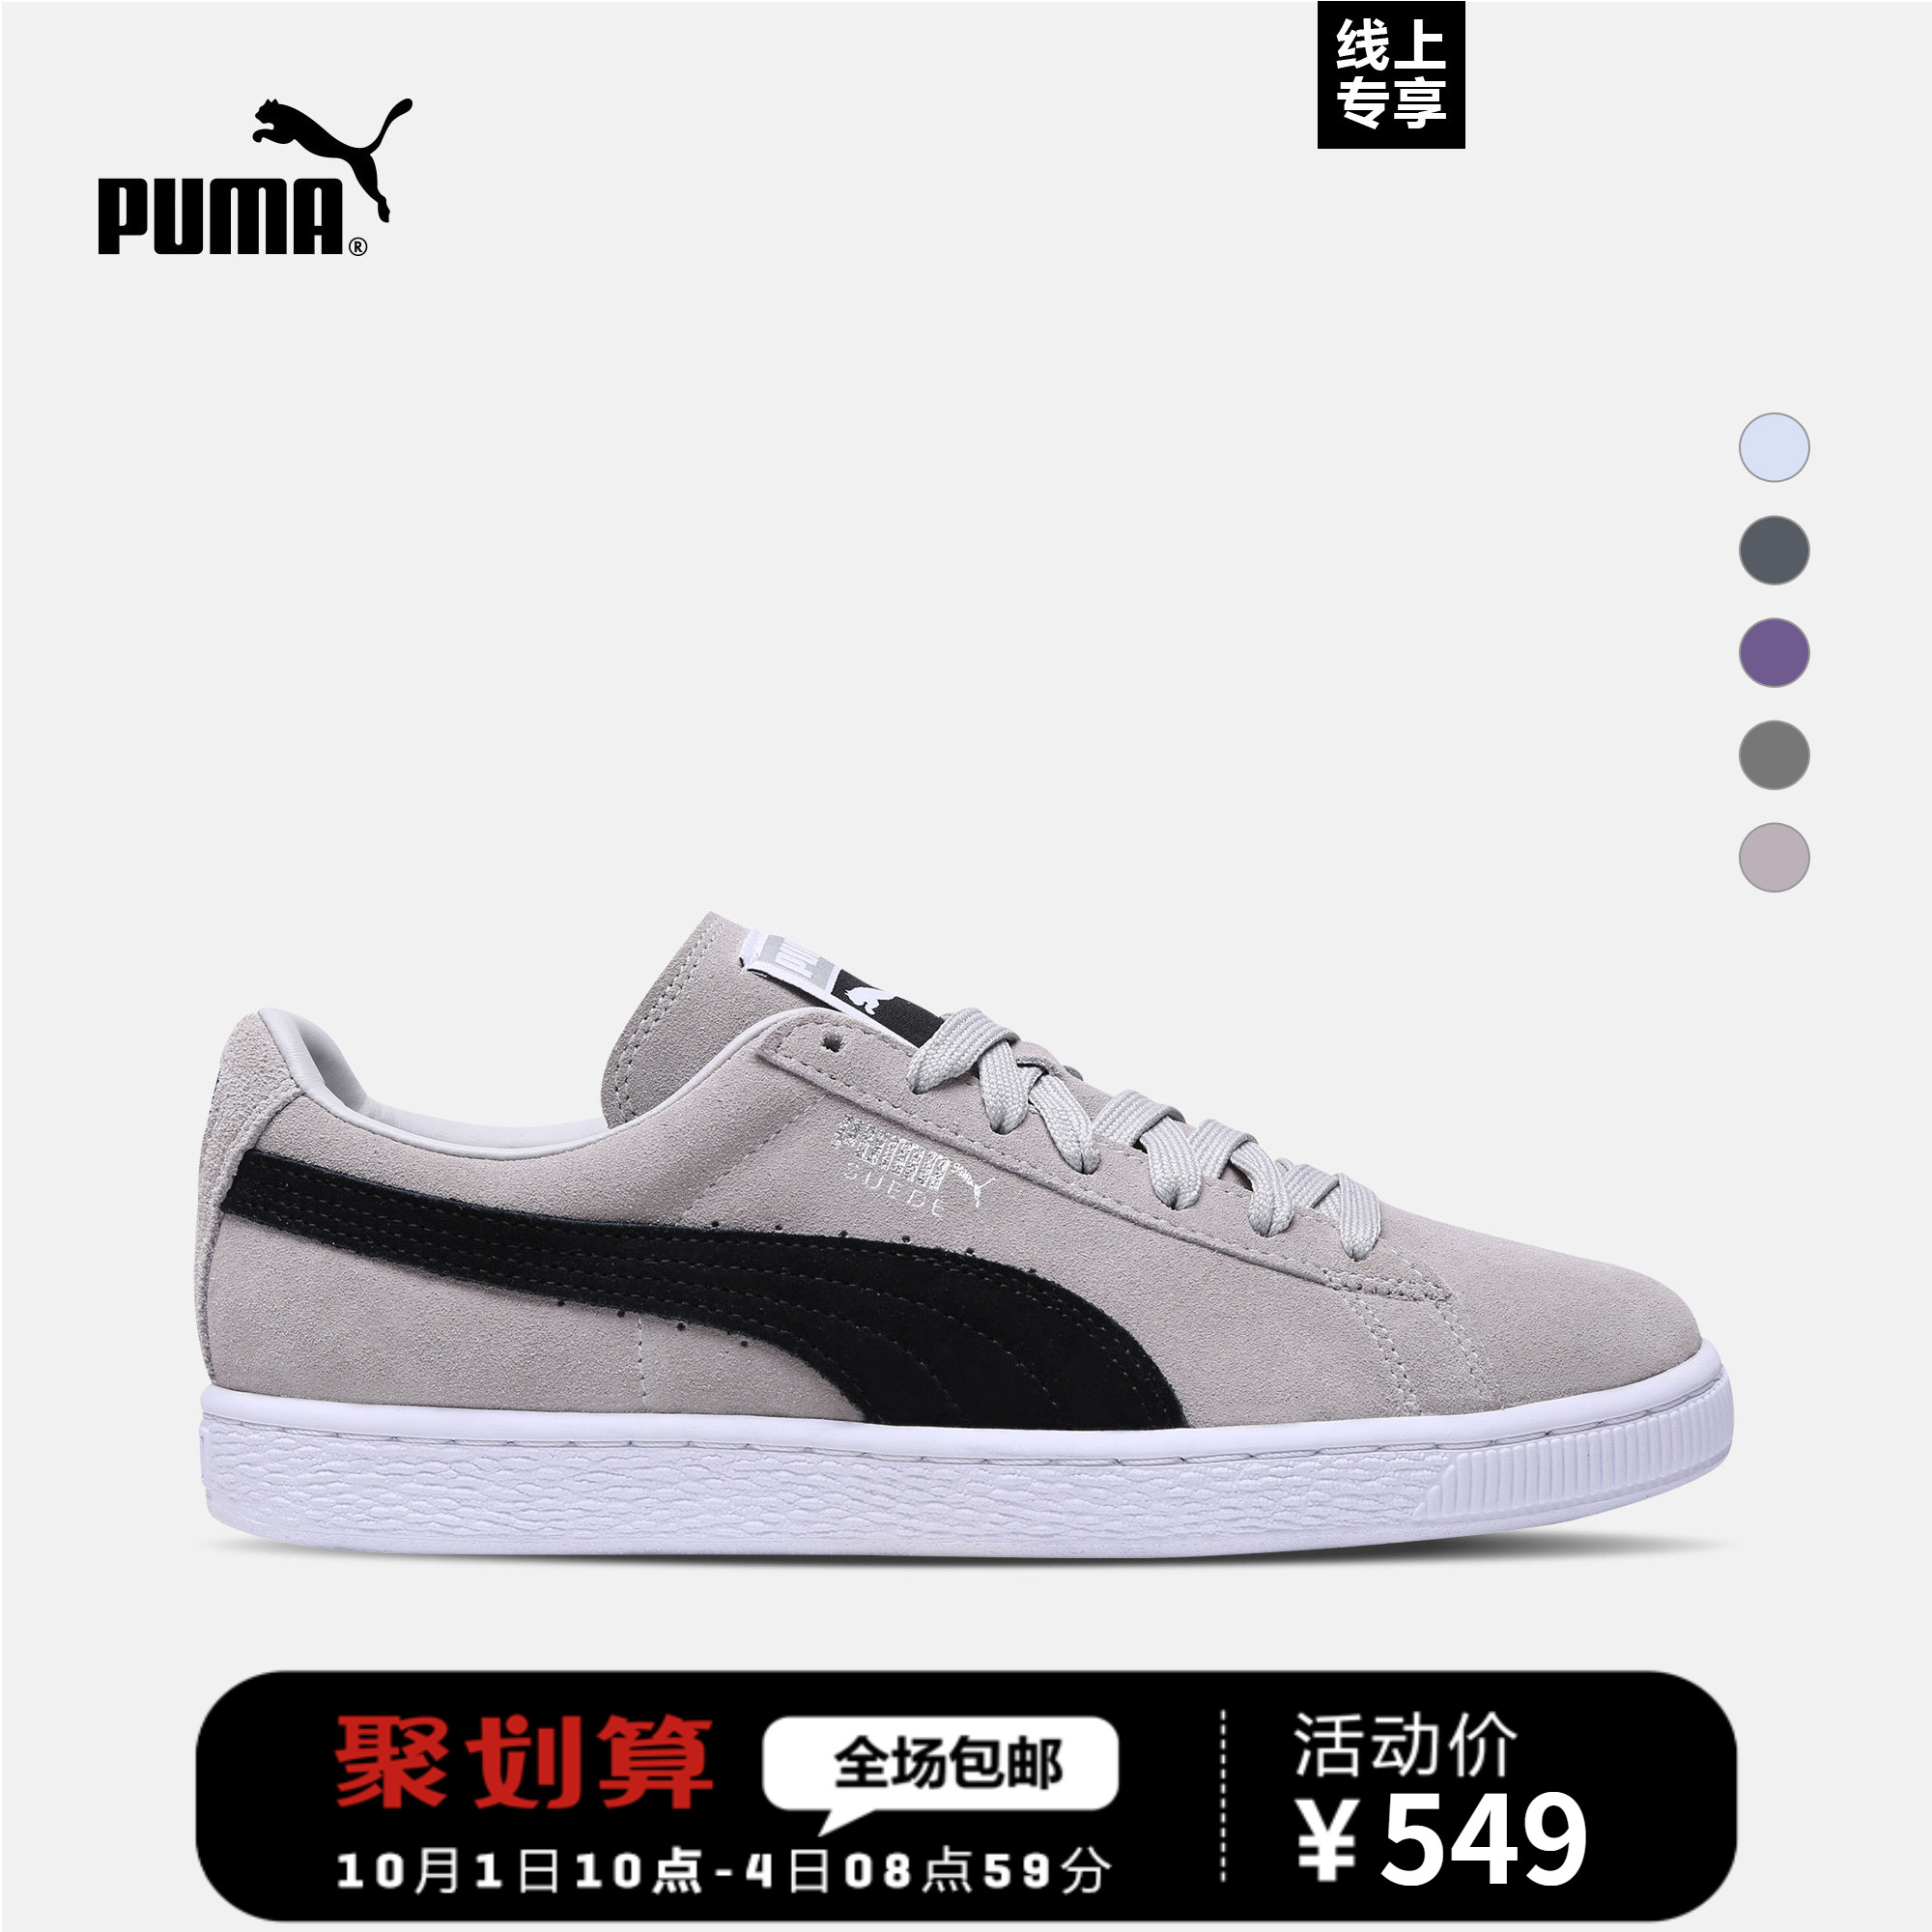 PUMA彪马官方 刘昊然同款 男女同款休闲鞋 SUEDE Classic 363242